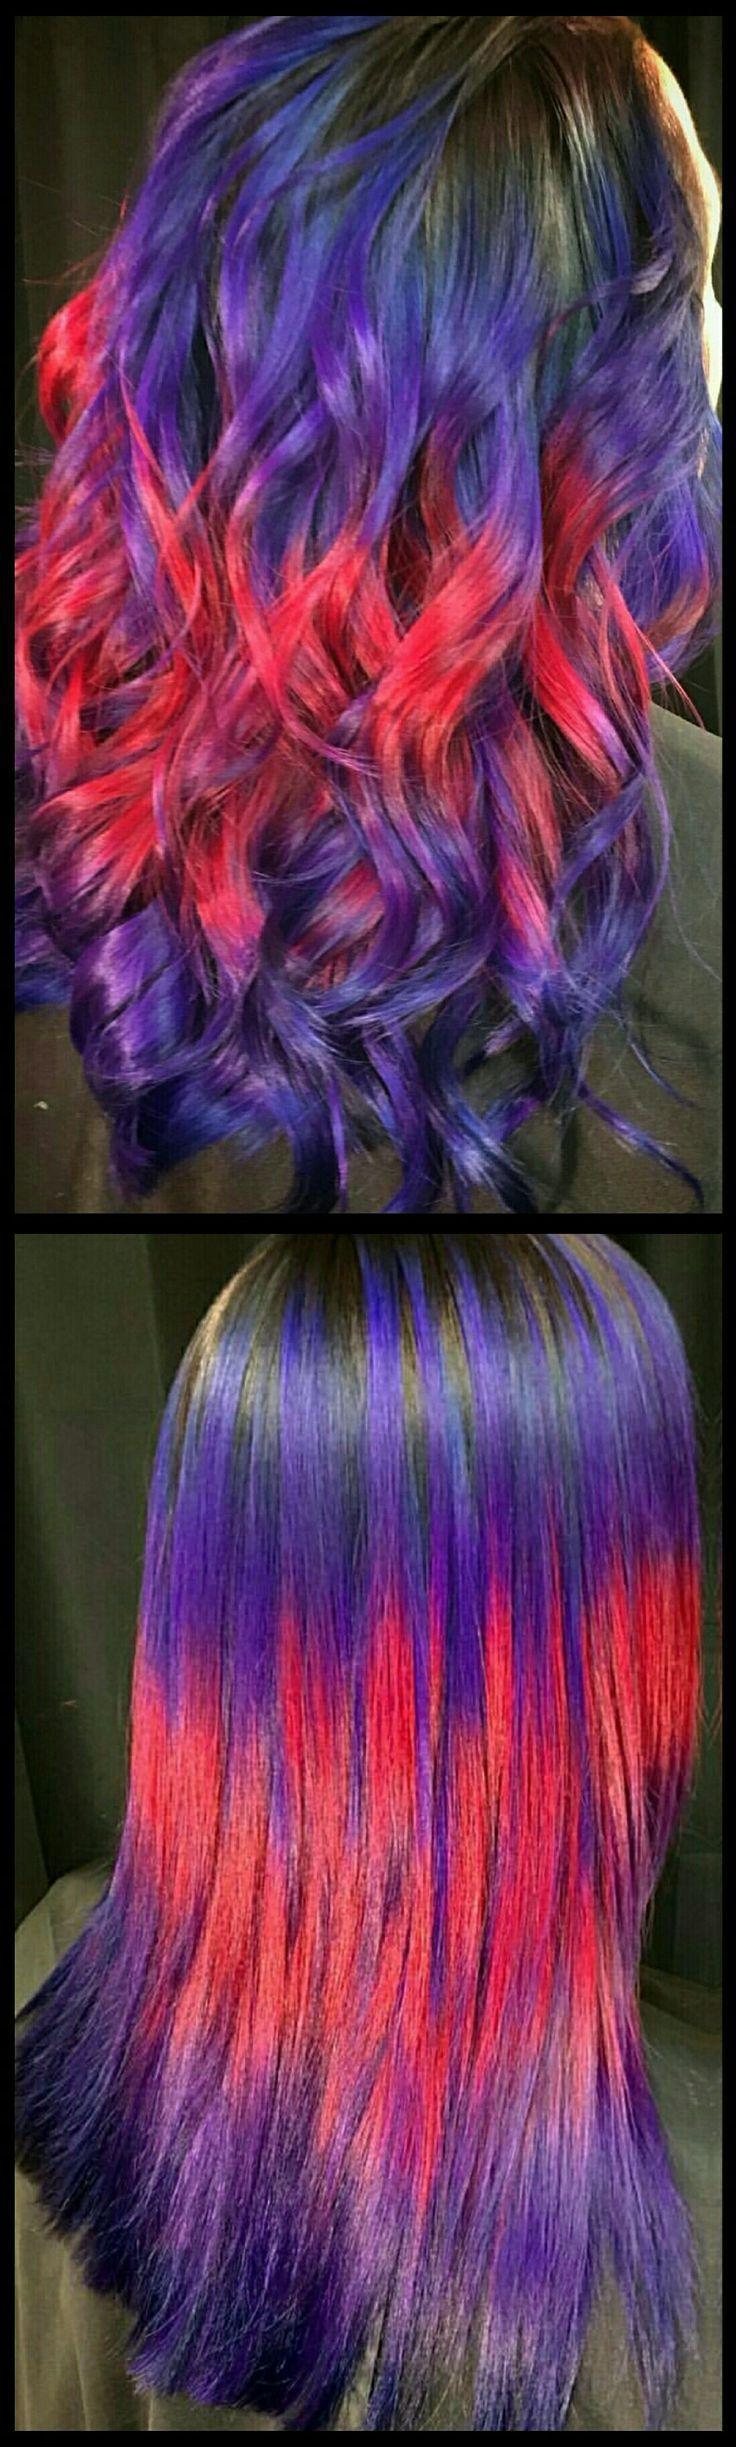 cool Purple pink dyed hair uggoff montana...... by http://www.dana-hairstyles.xyz/scene-hair/purple-pink-dyed-hair-uggoff-montana/